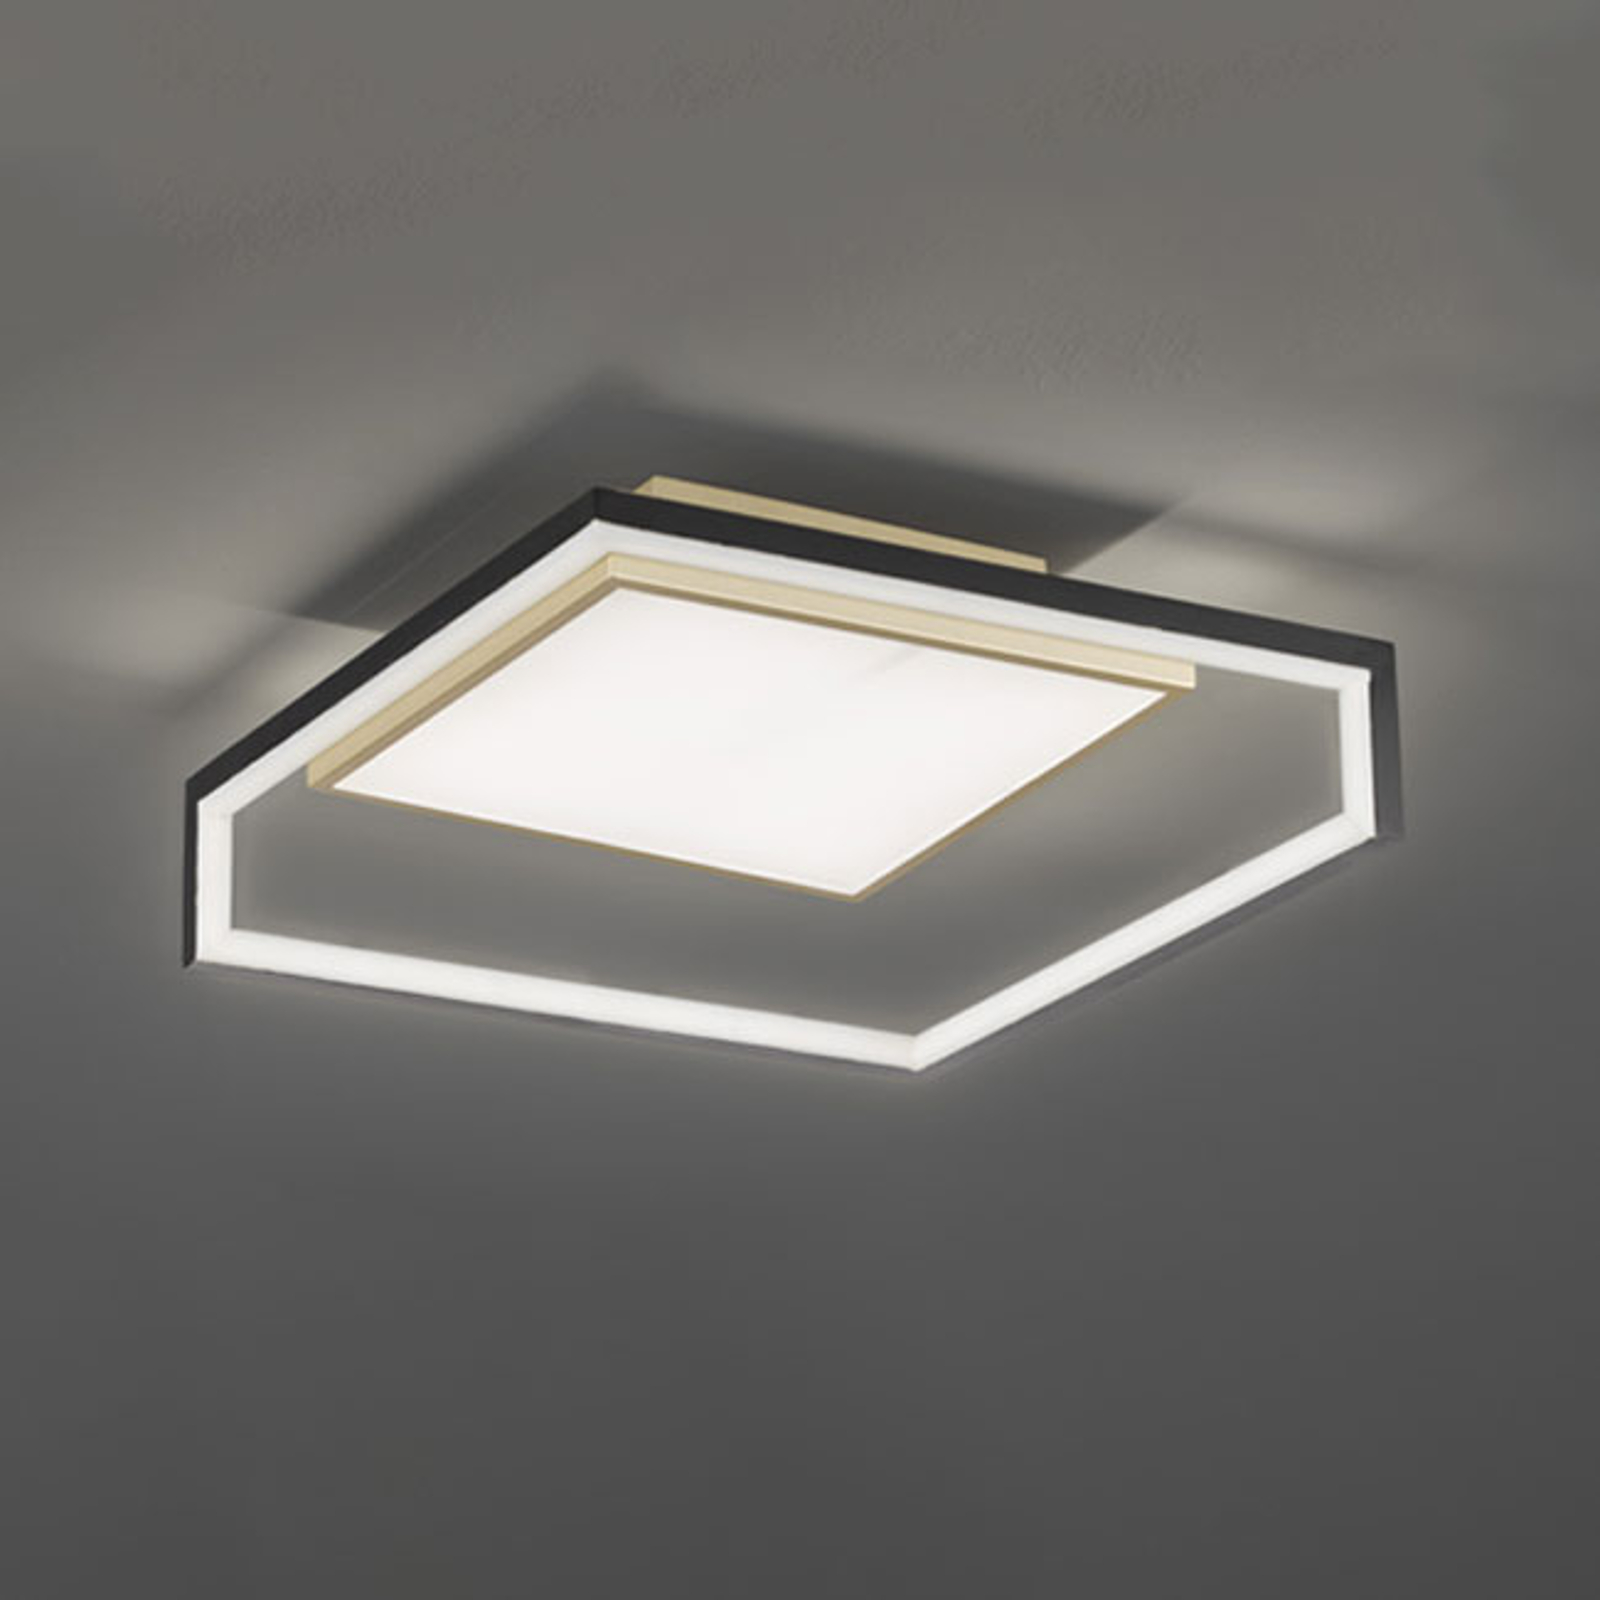 LED-Deckenleuchte Nala in modernem Design